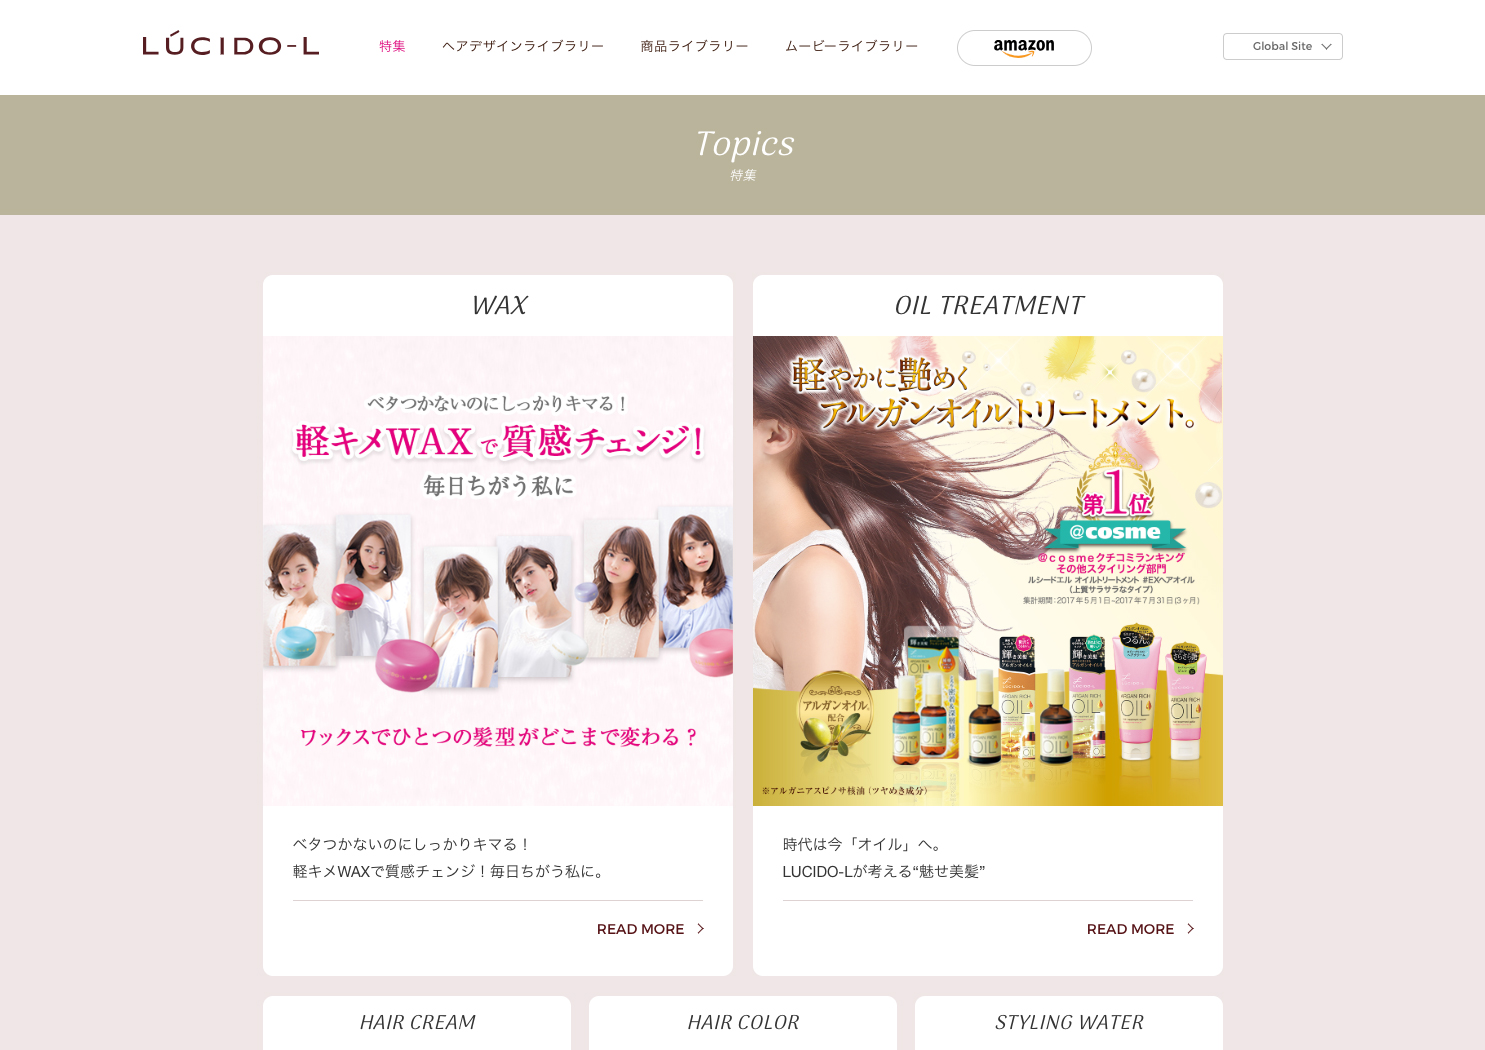 mandom LUCIDO-L Official Website 2018